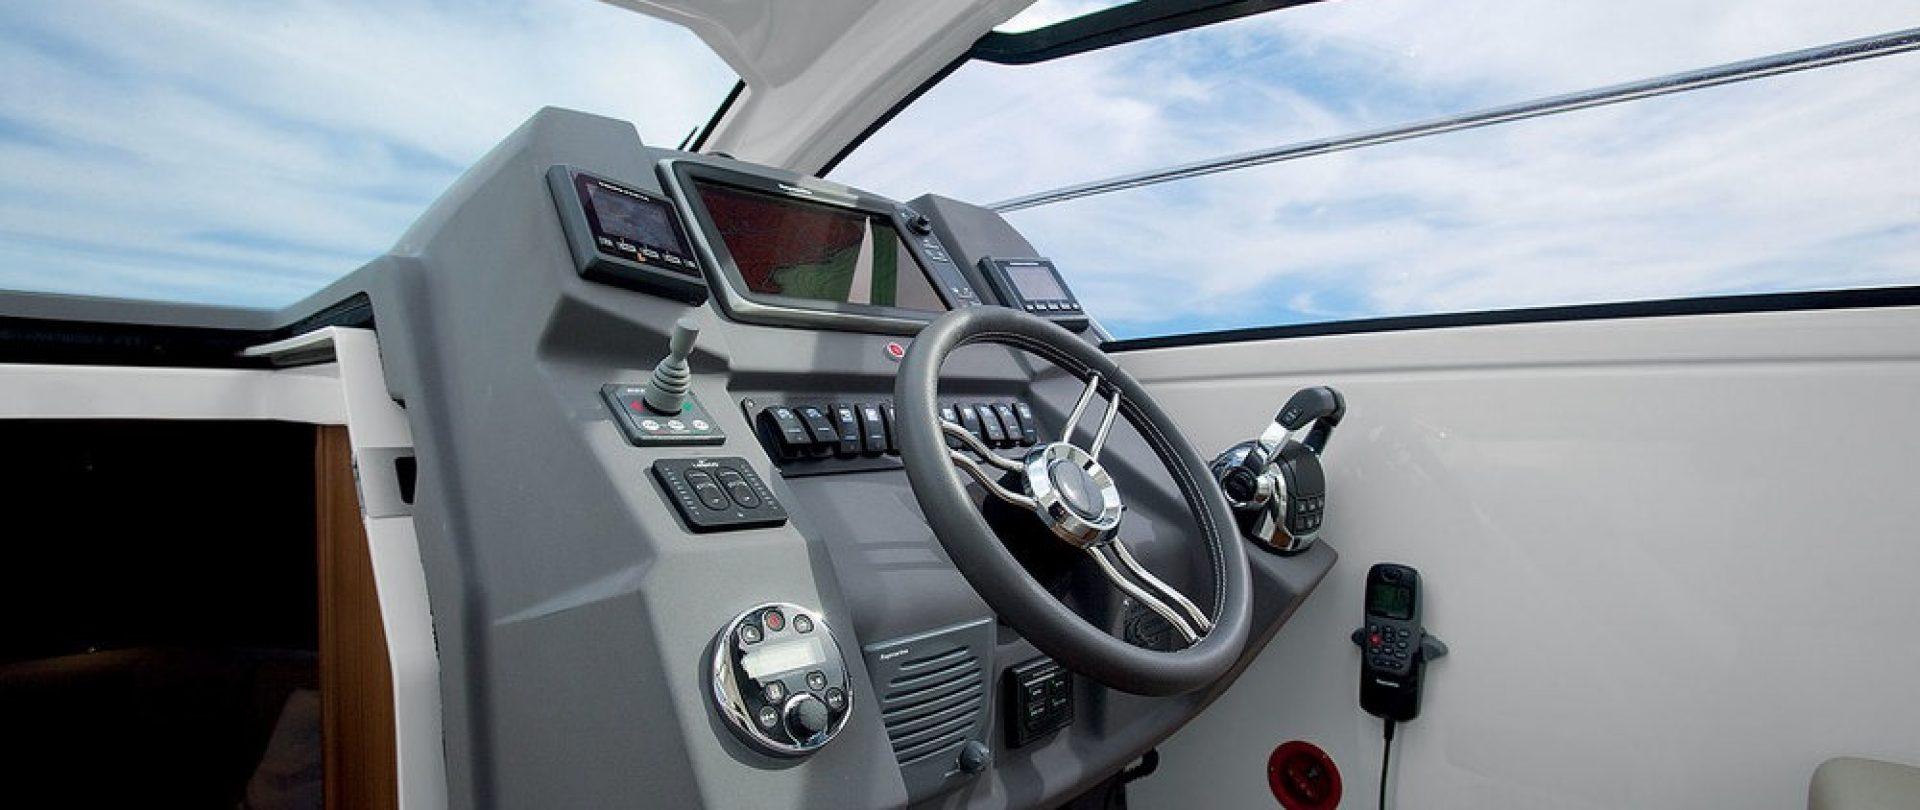 1500-12-A34-Helmstation